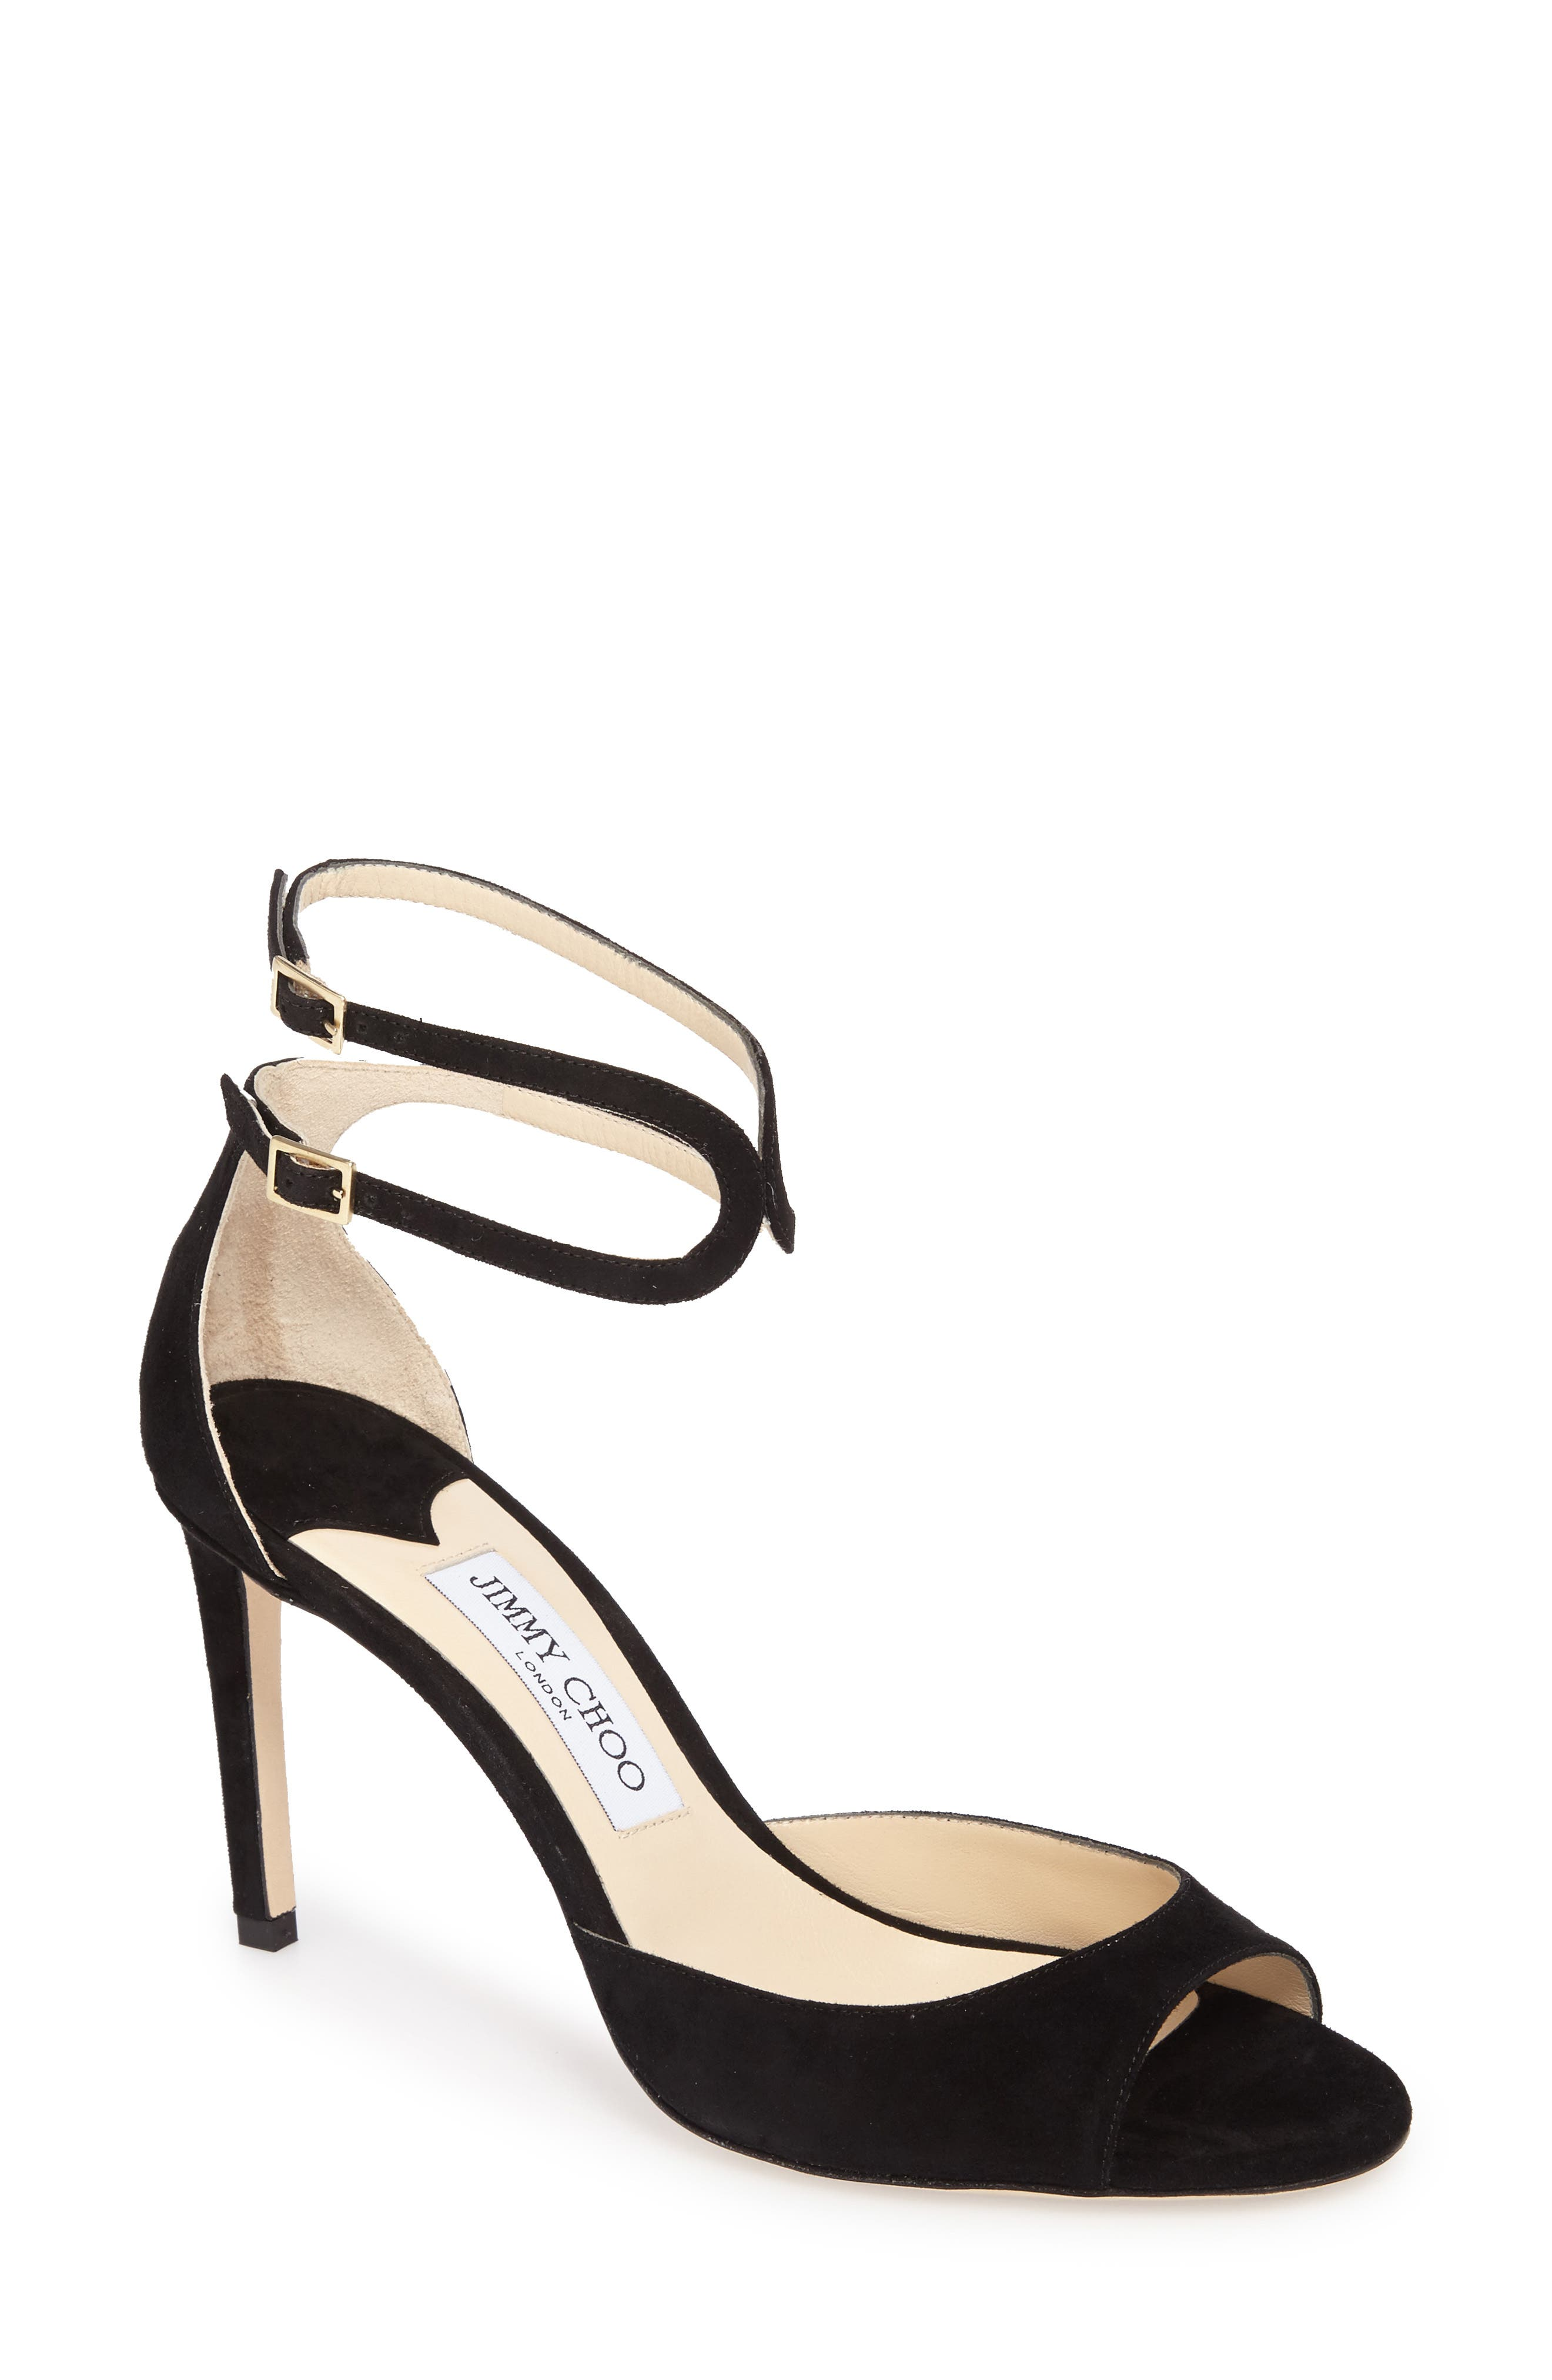 Lane Sandal,                         Main,                         color, Black